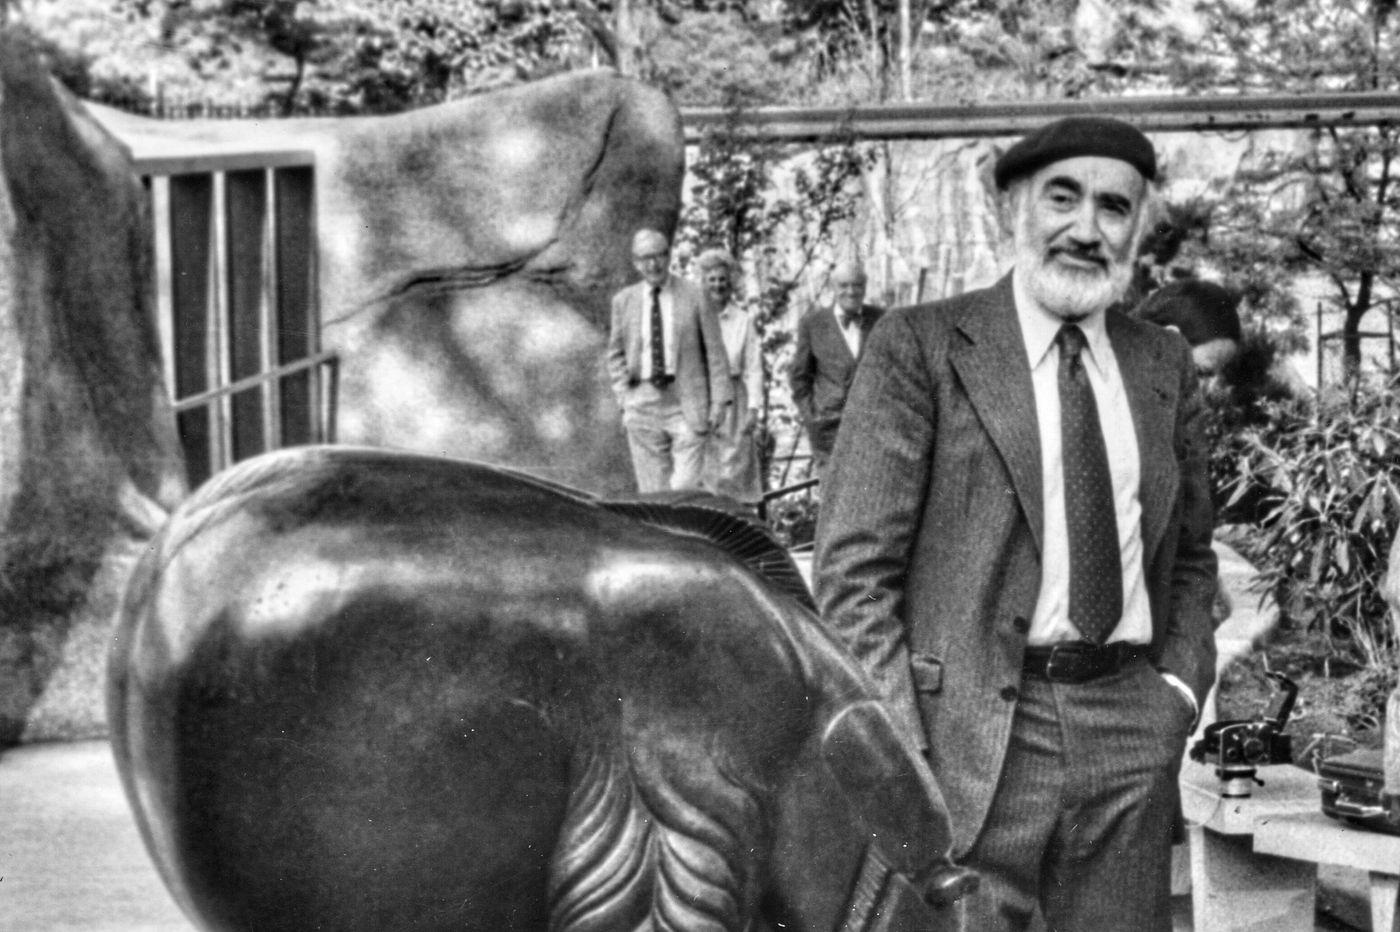 EvAngelos Frudakis, 97, of Philadelphia, noted sculptor and teacher